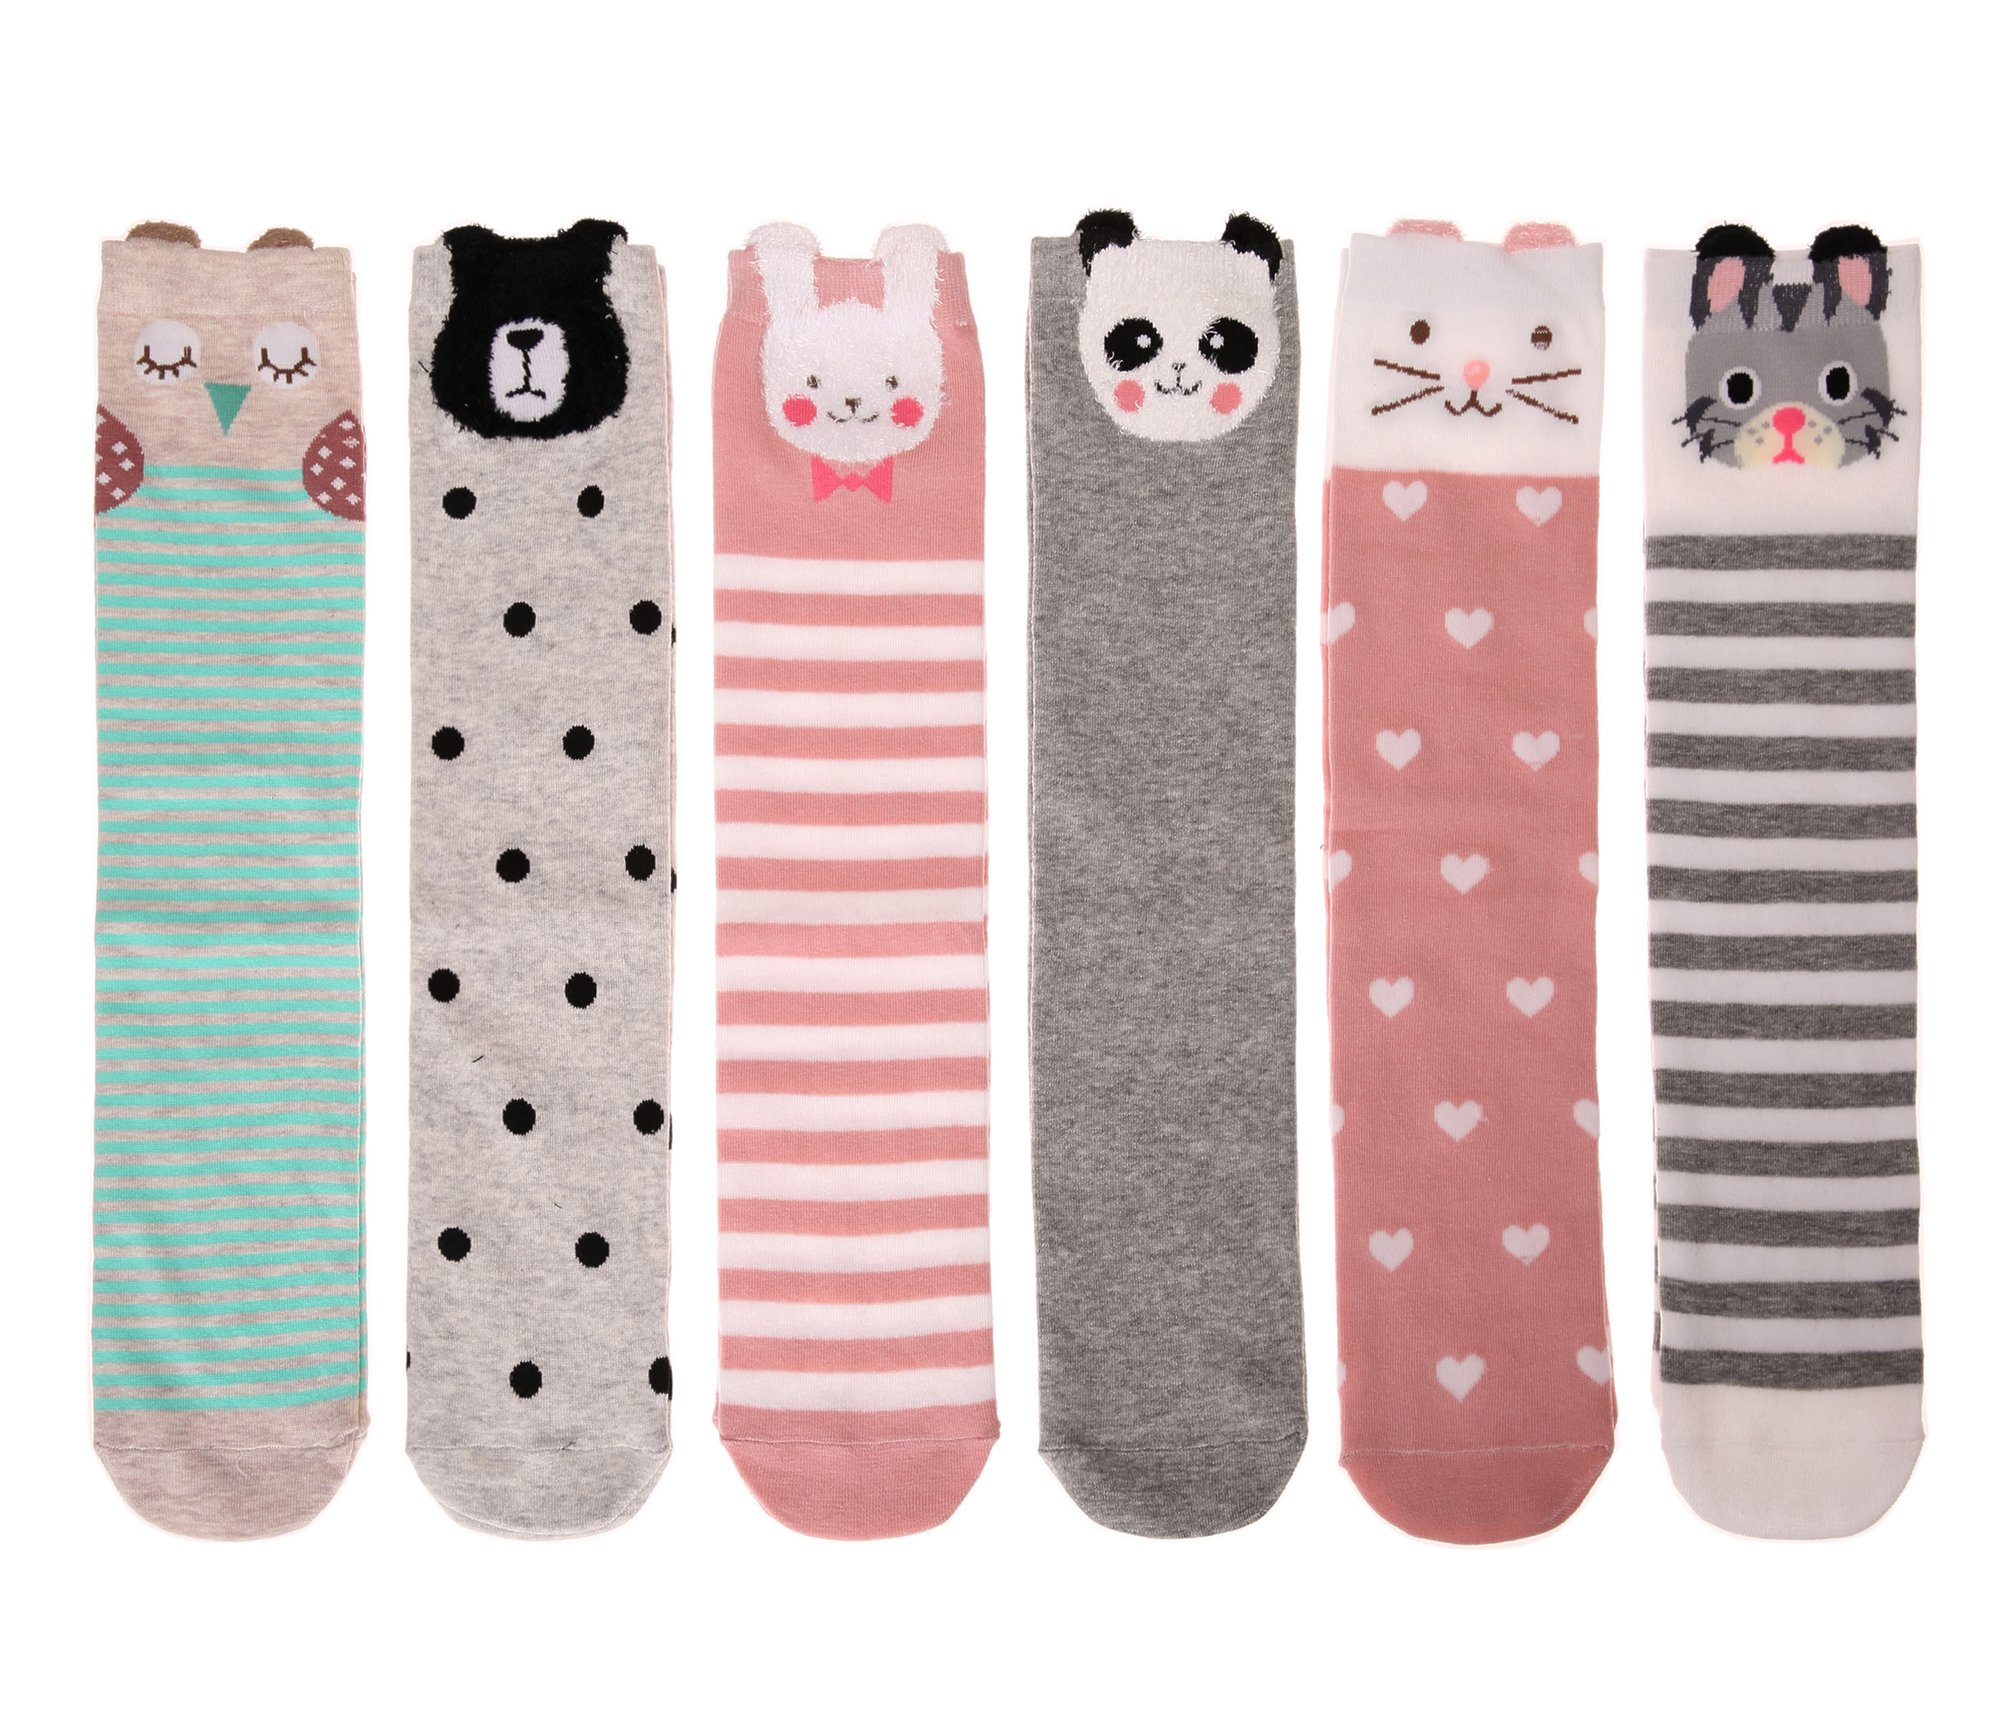 Color City Kids Girls Socks Knee High Stockings Cartoon Animal Theme Cotton Socks (6 Pairs) by Color City (Image #3)